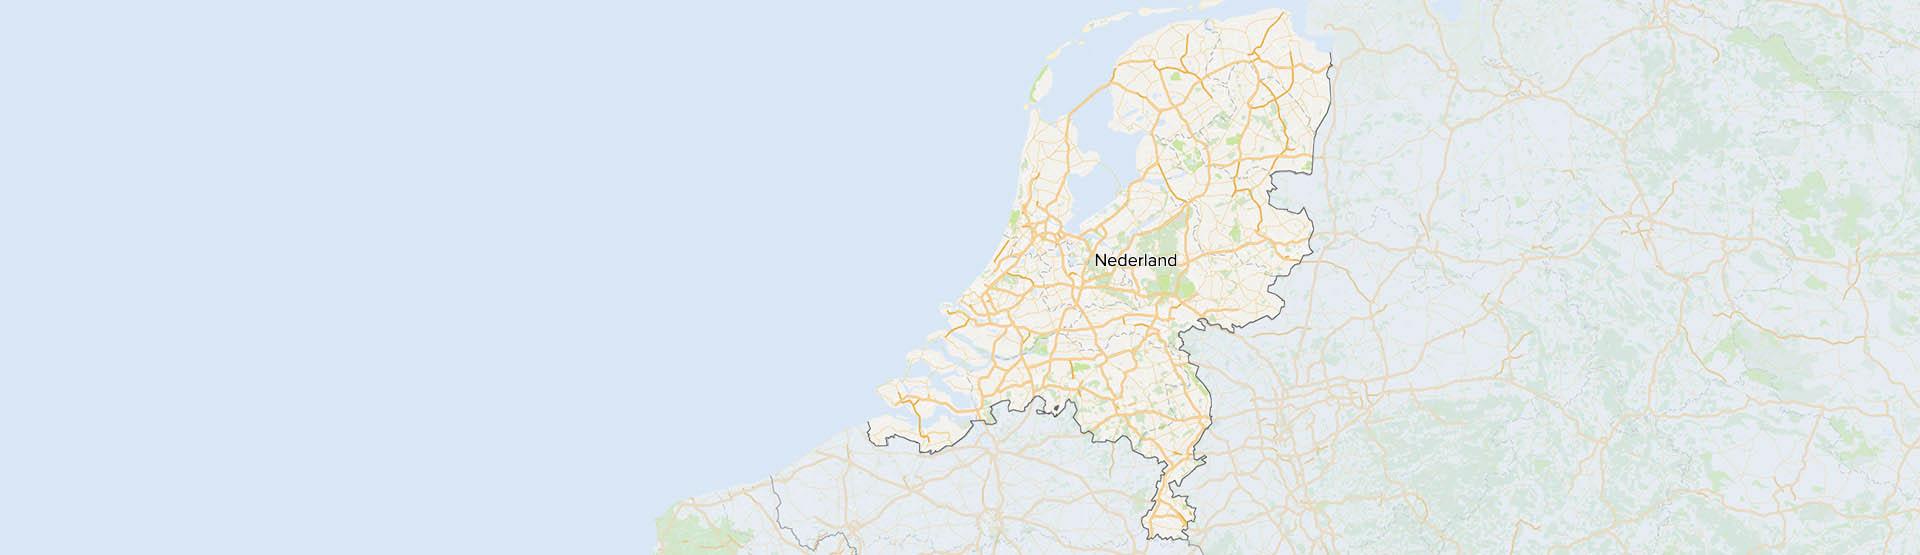 van-boxtel-map